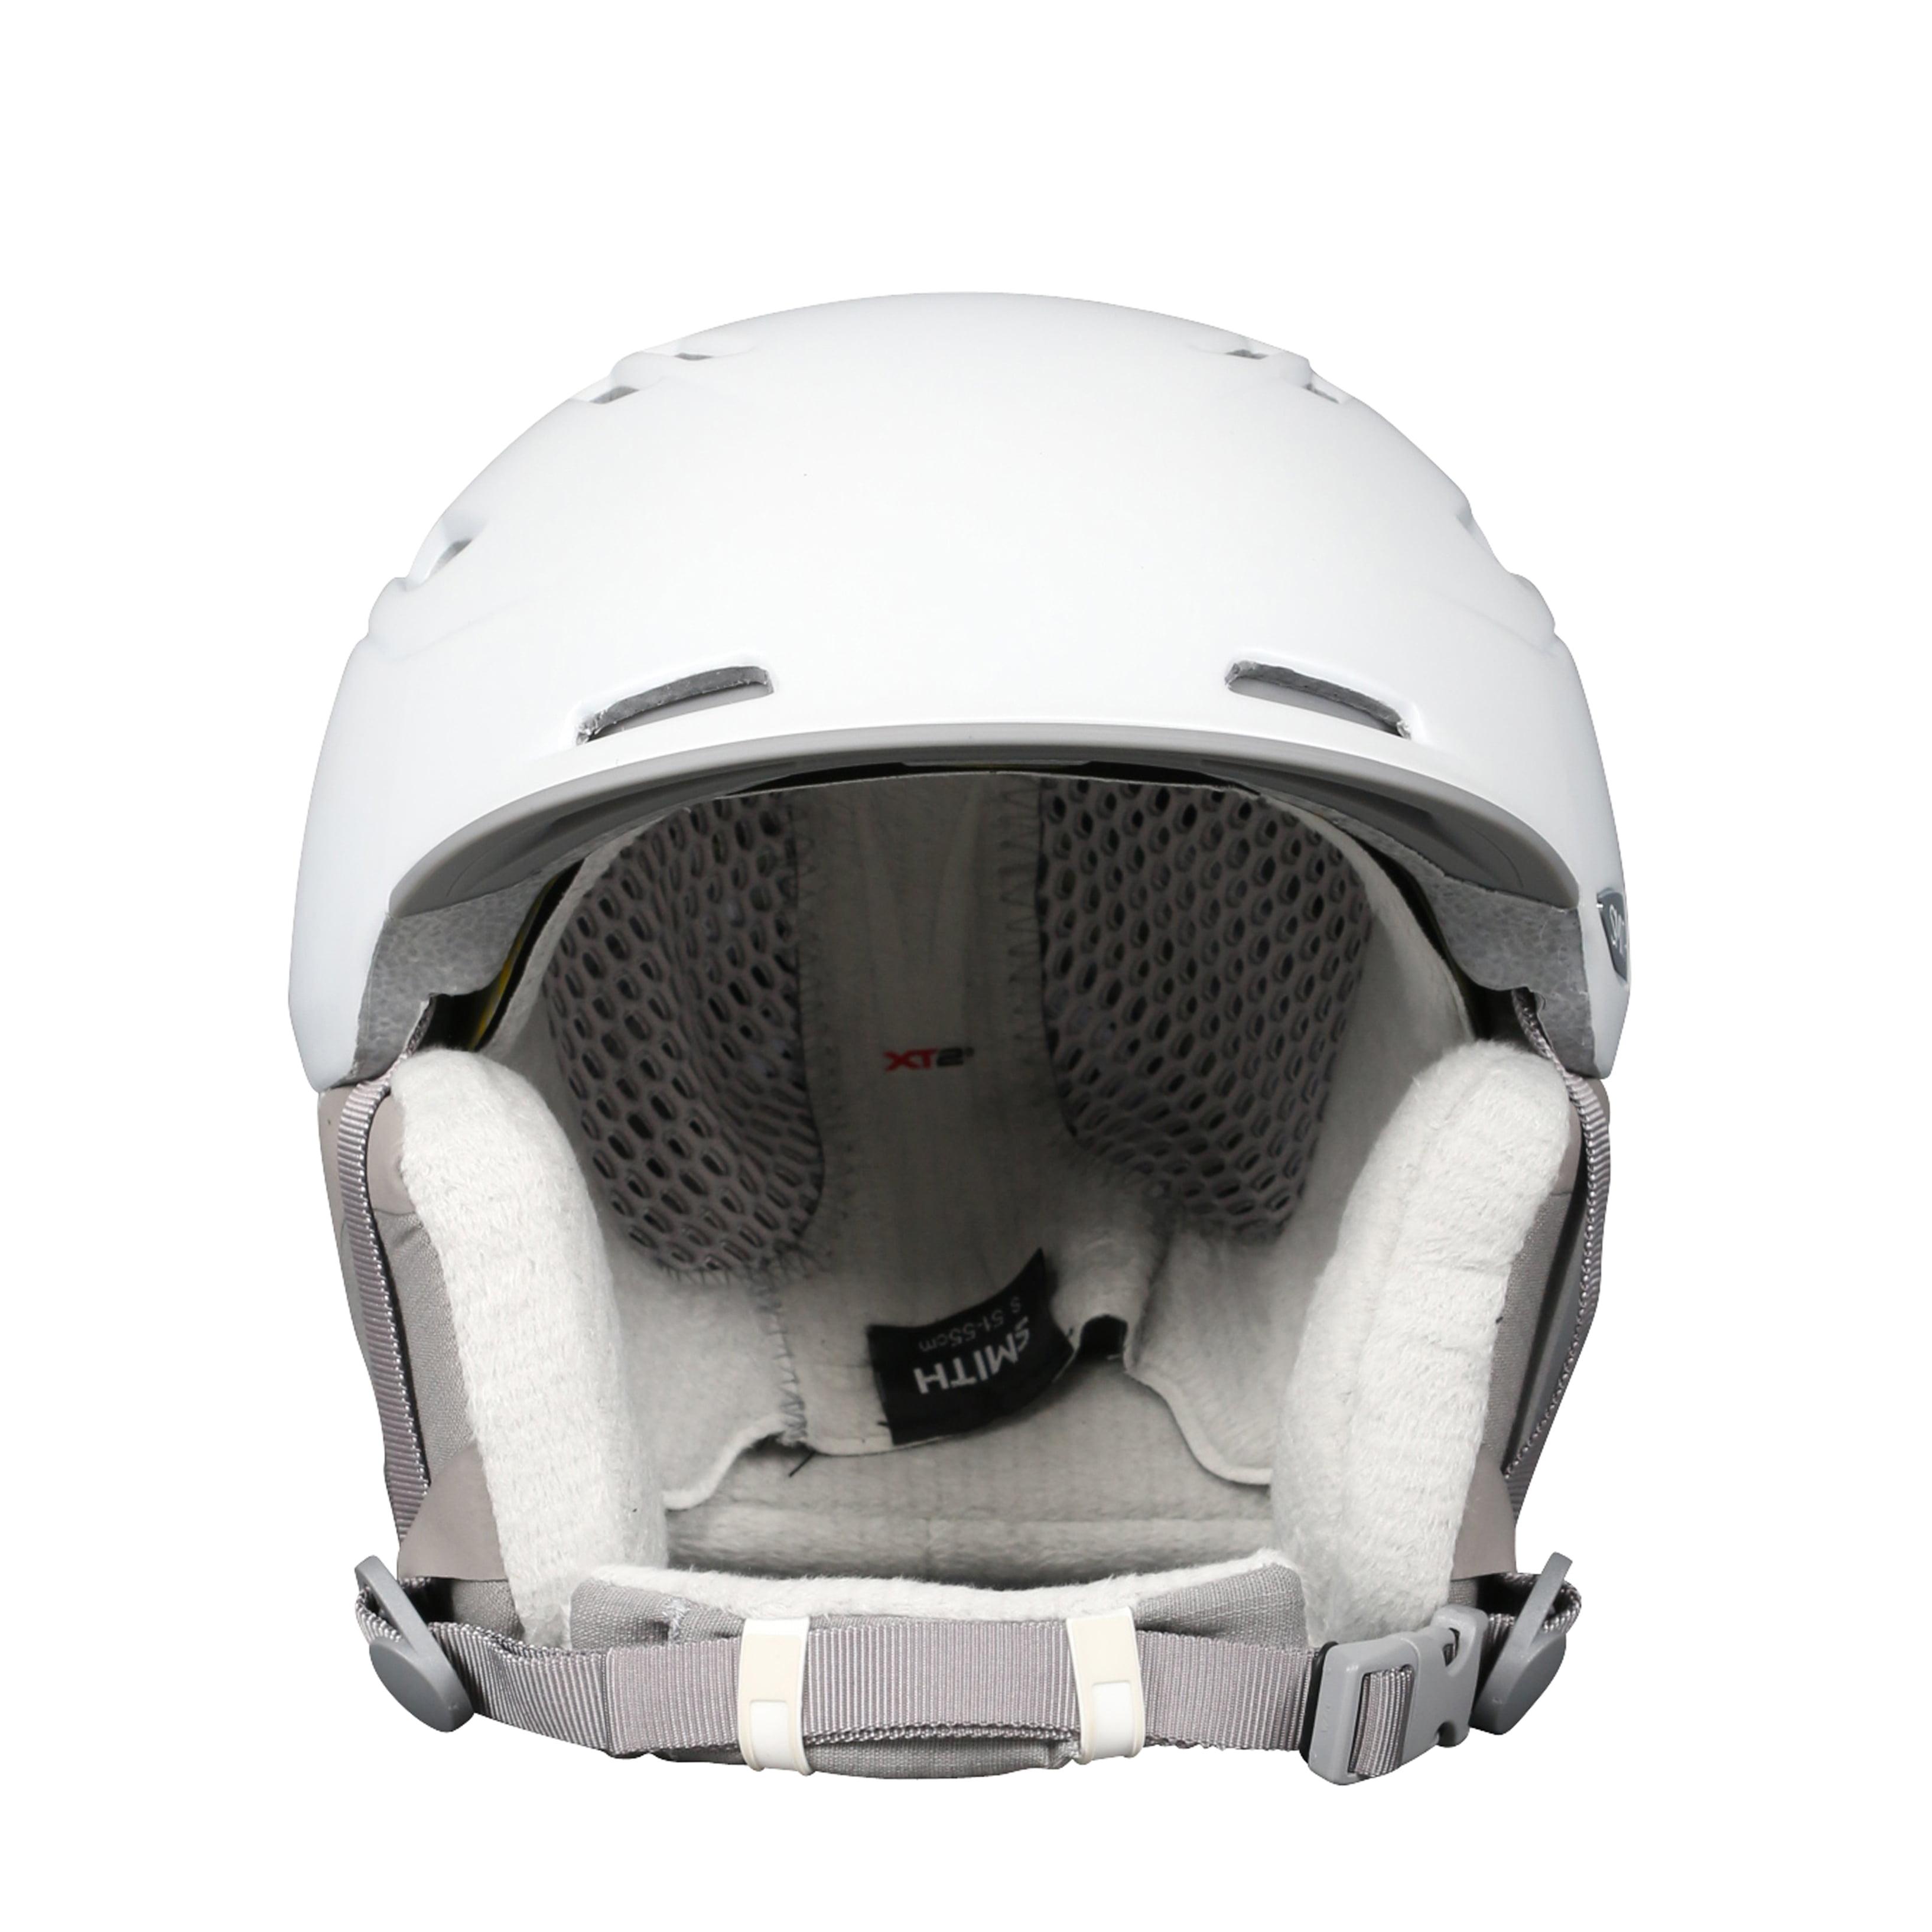 Smith Optics Compass Pearl White MIPS Women's Ski Snowboard Helmet by Smith Optics